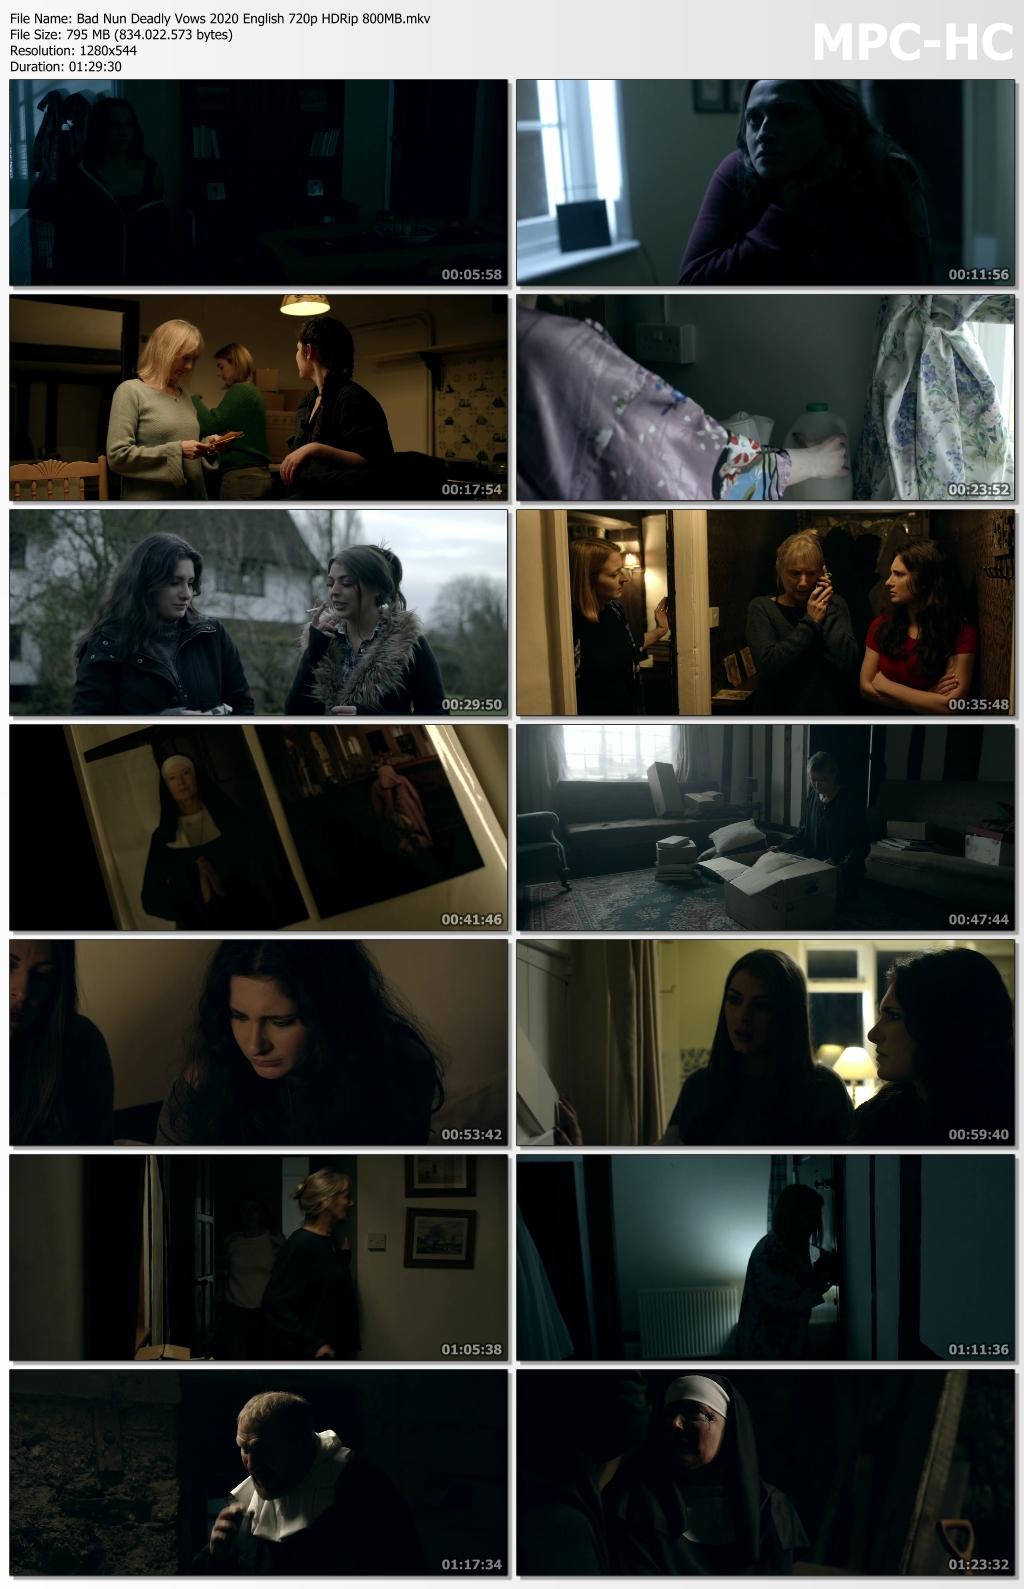 Bad-Nun-Deadly-Vows-2020-English-720p-HDRip-800-MB-mkv-thumbs